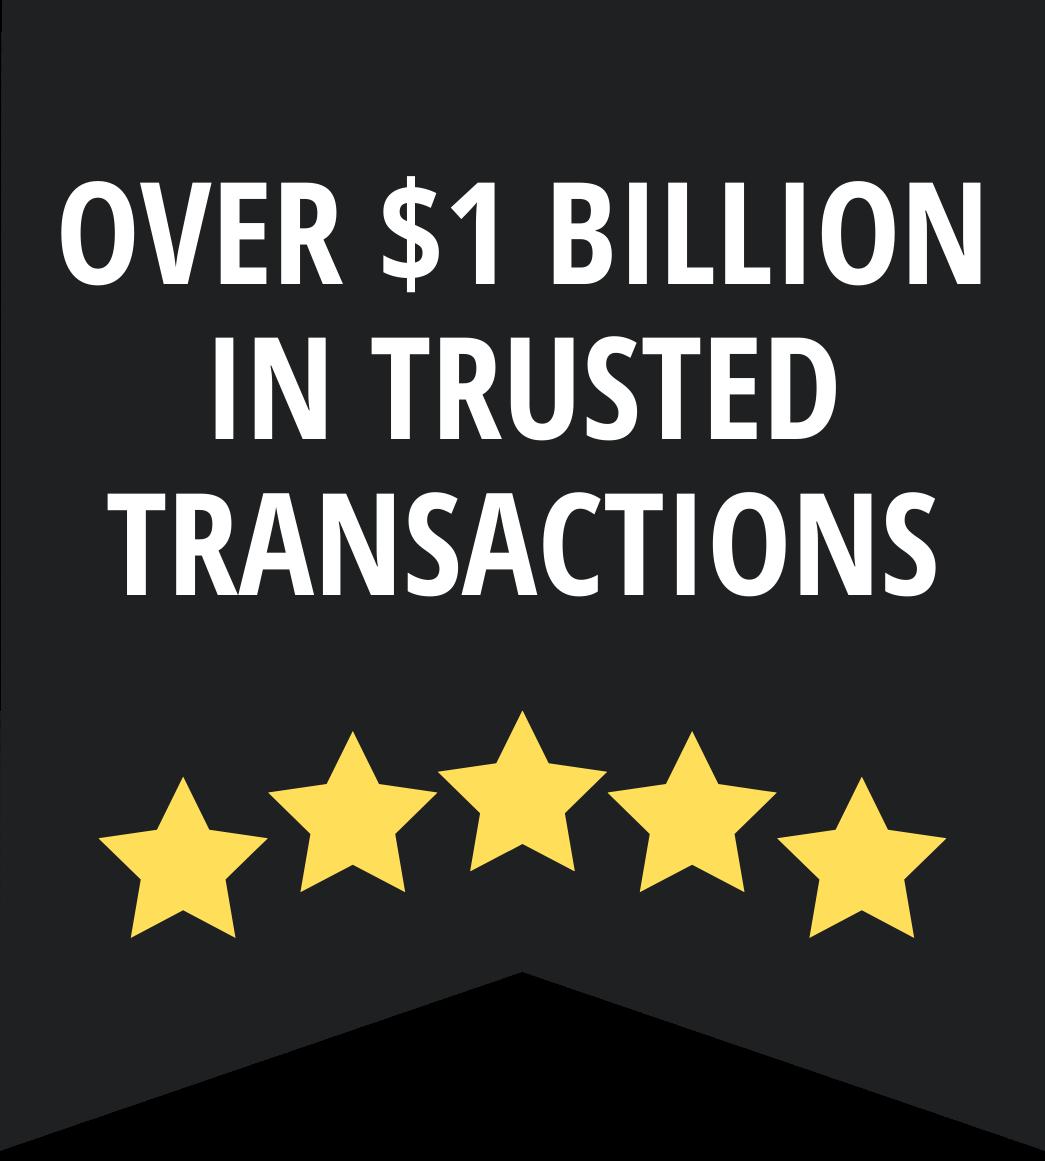 One Billion Transactions Image